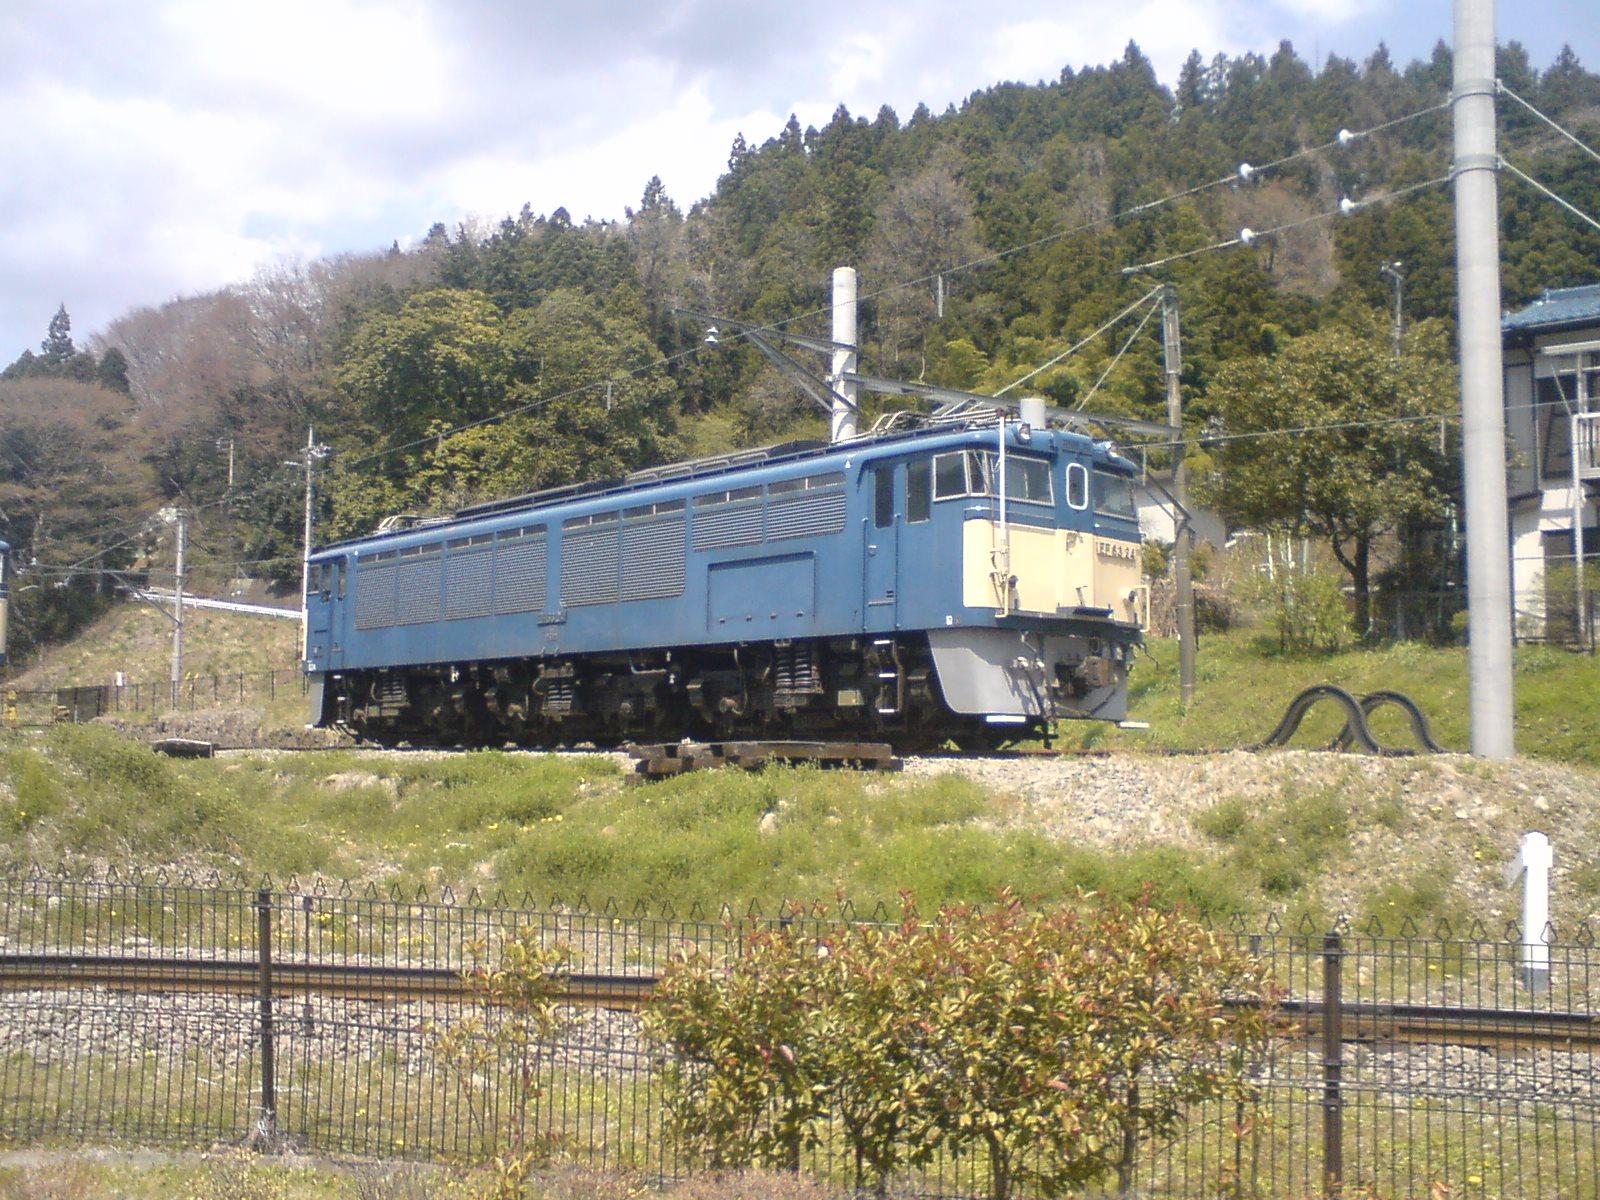 Kc380076